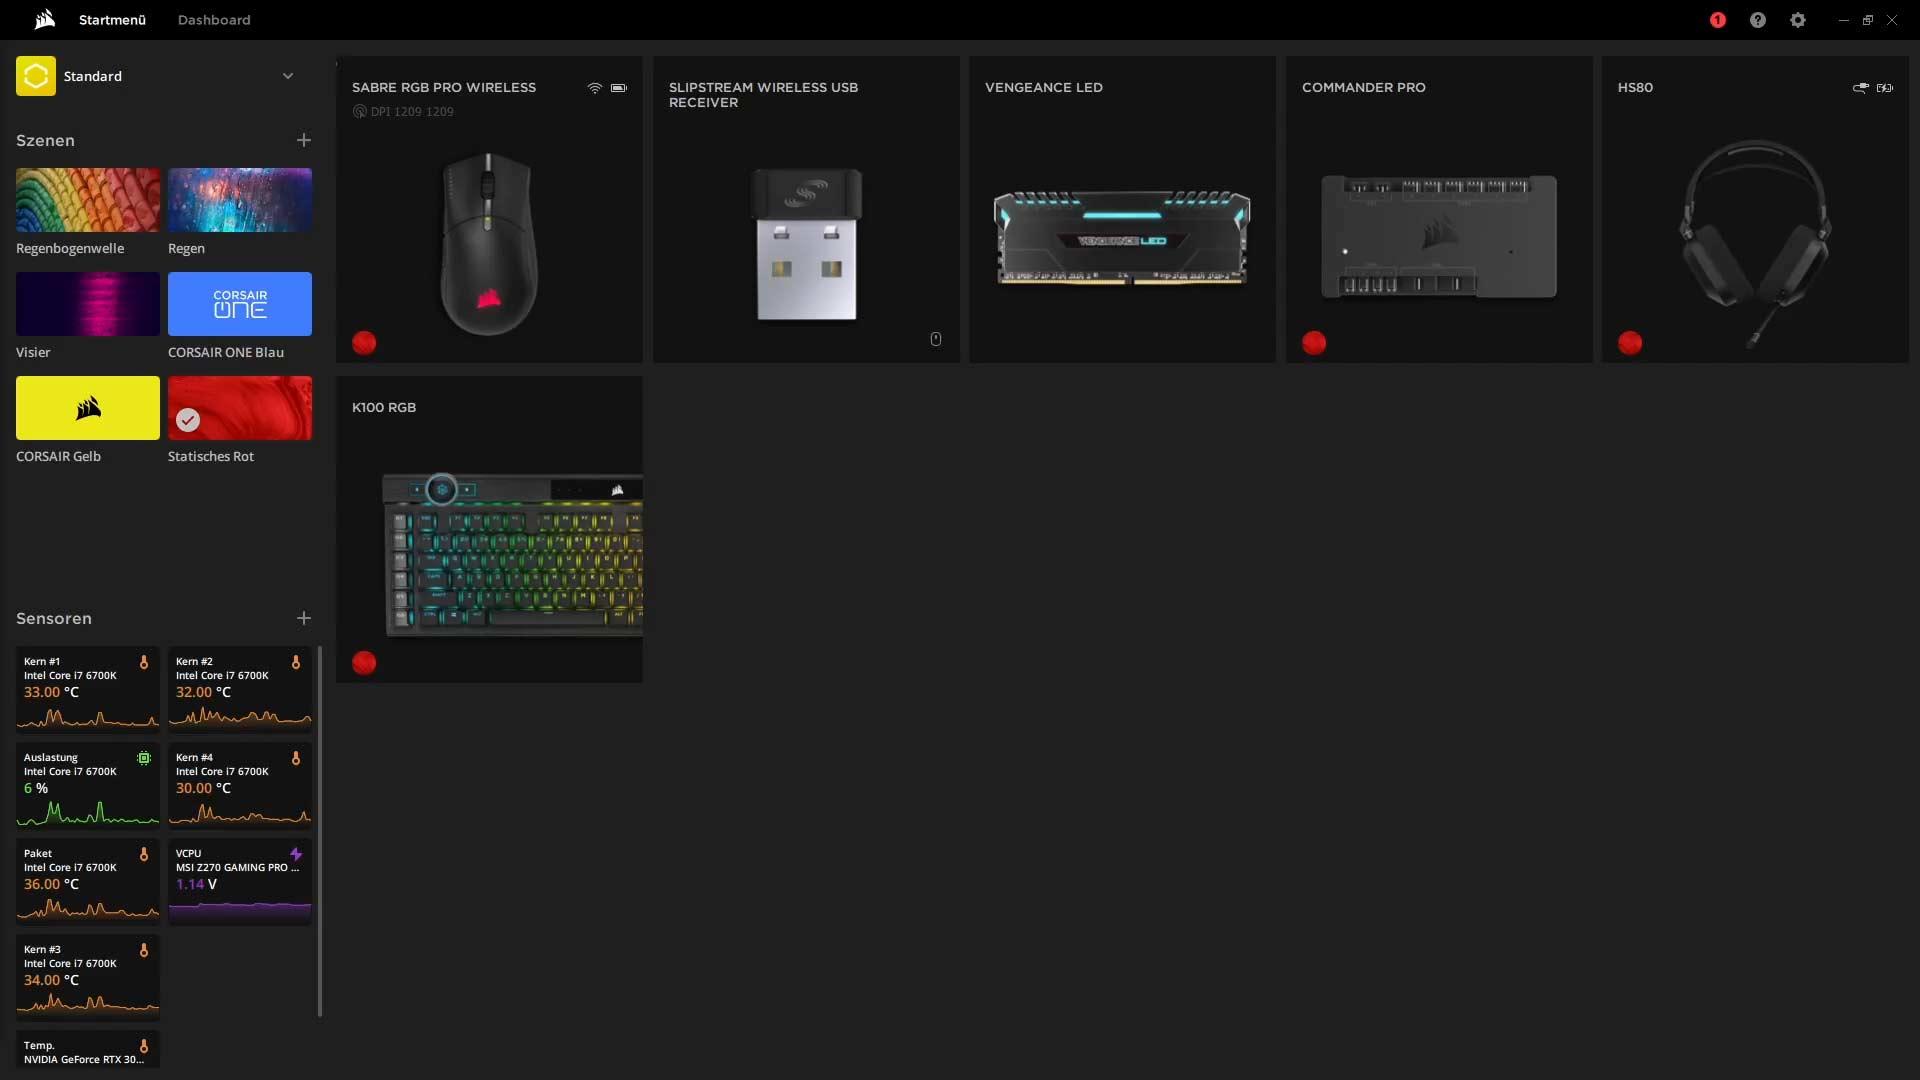 Corsair Sabre RGB Pro Wireless - iCUE